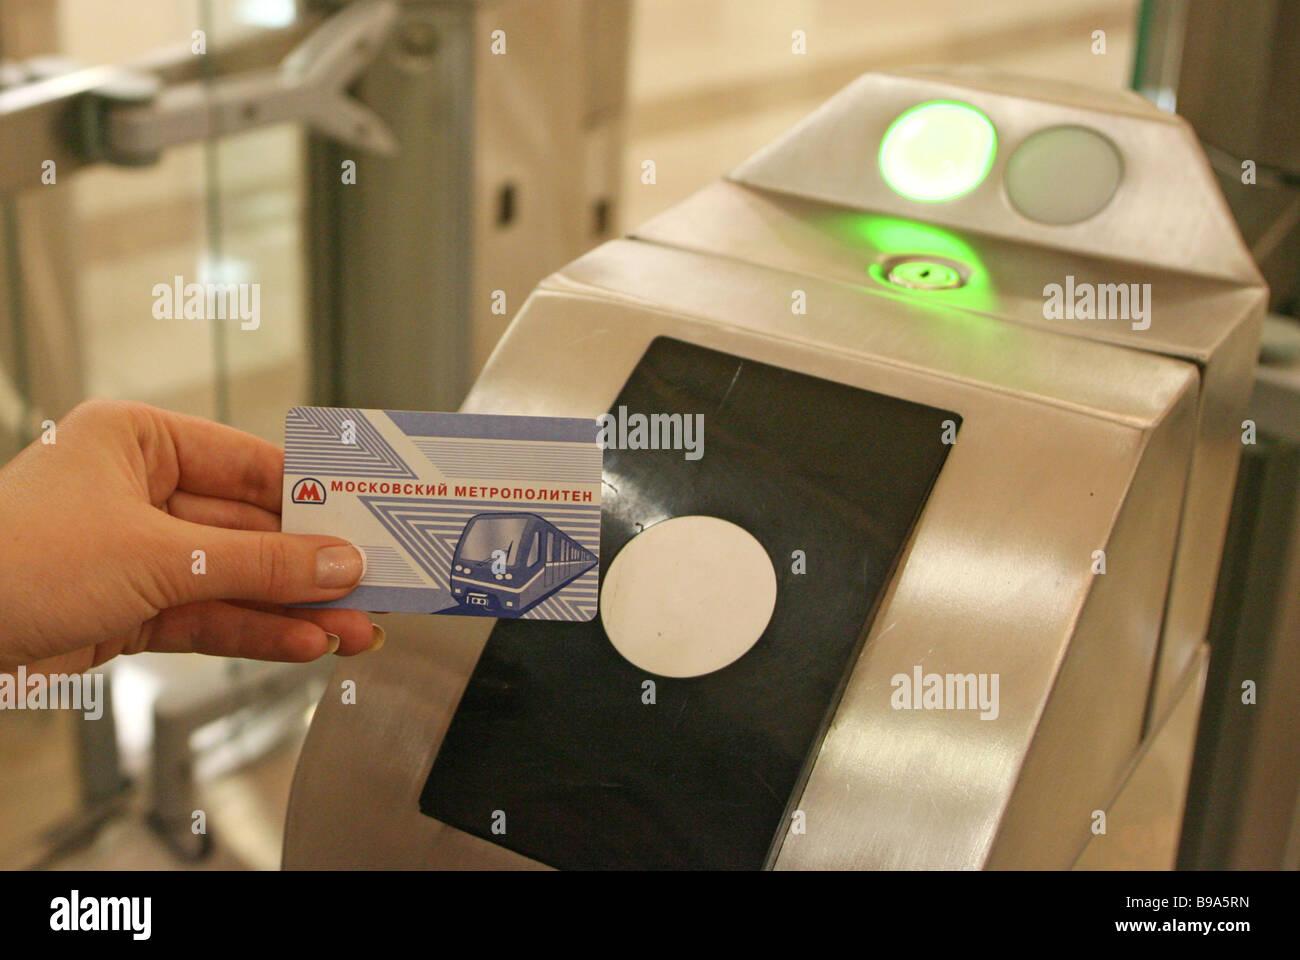 Am 20. Januar Moskau s bringt Metro in Umlauf berührungslose Chipkarten Stockbild